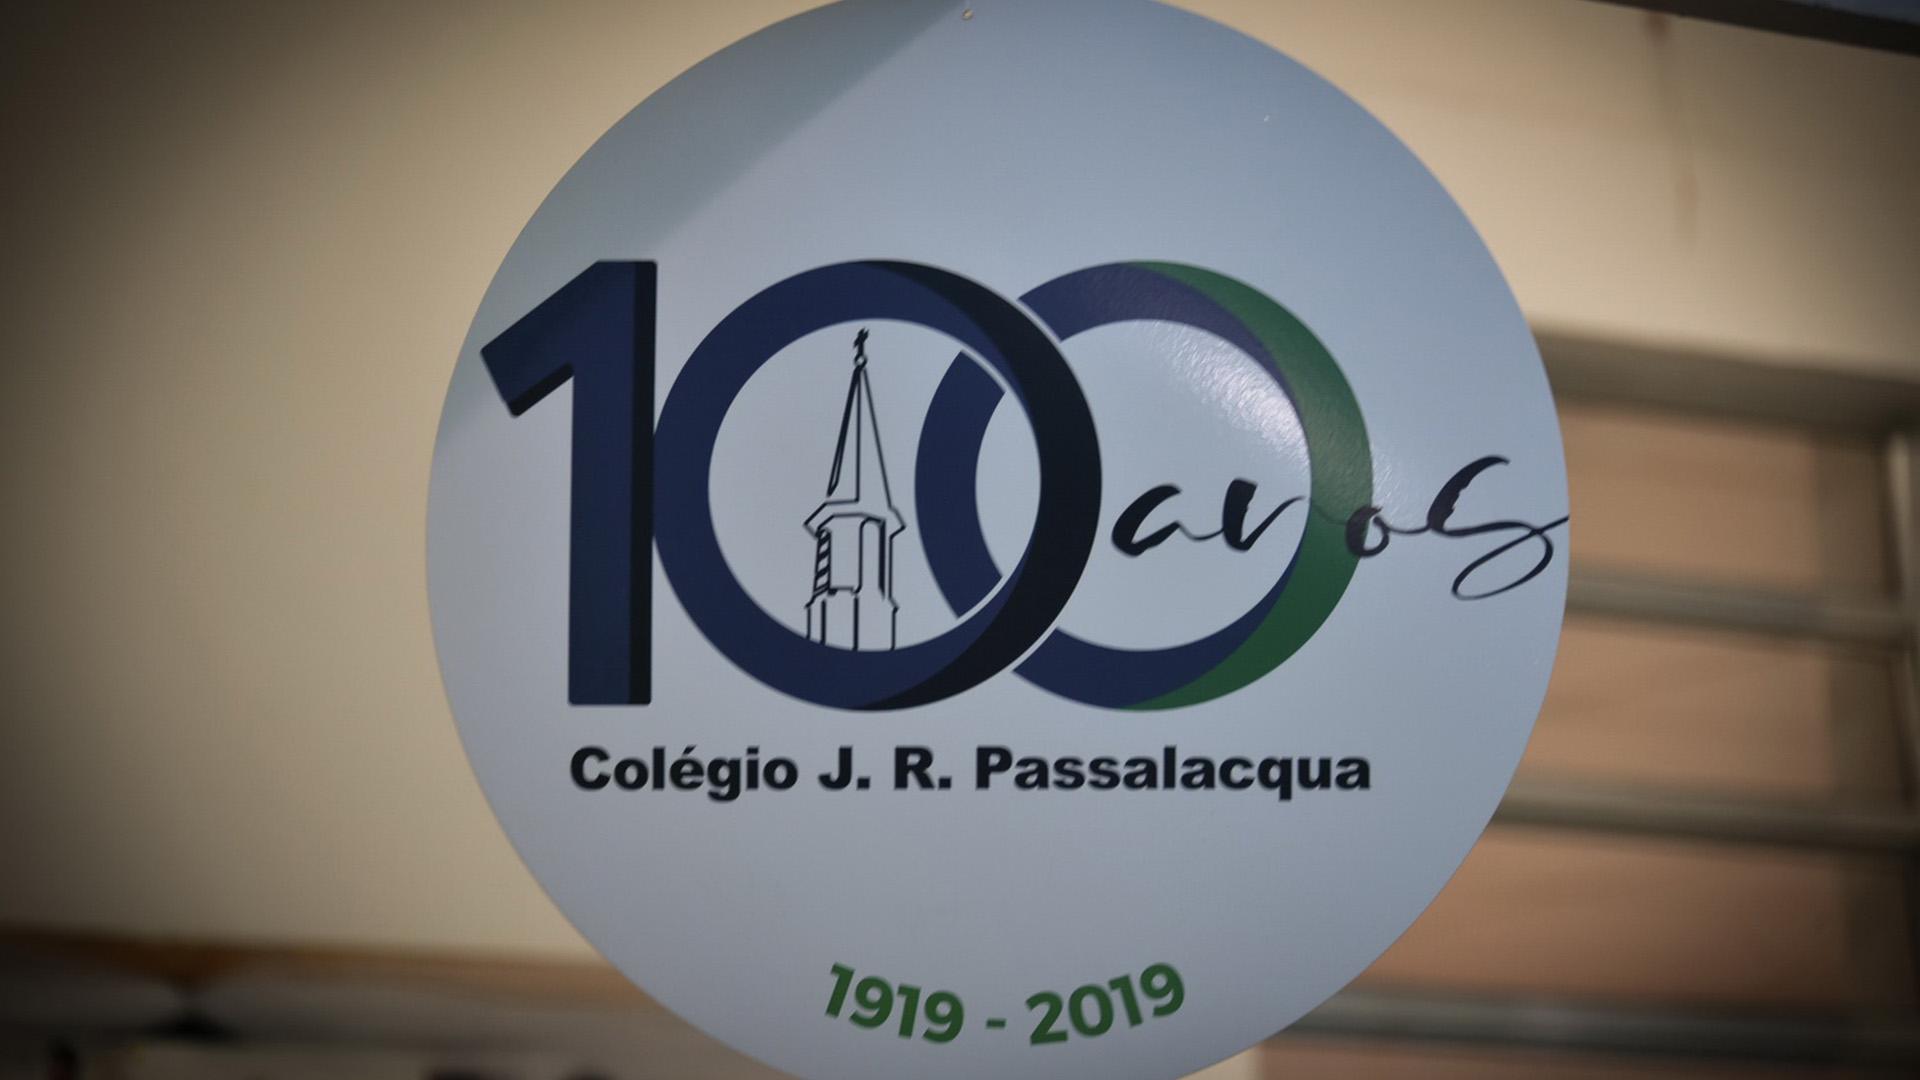 [100 Anos J. R. Passalacqua]